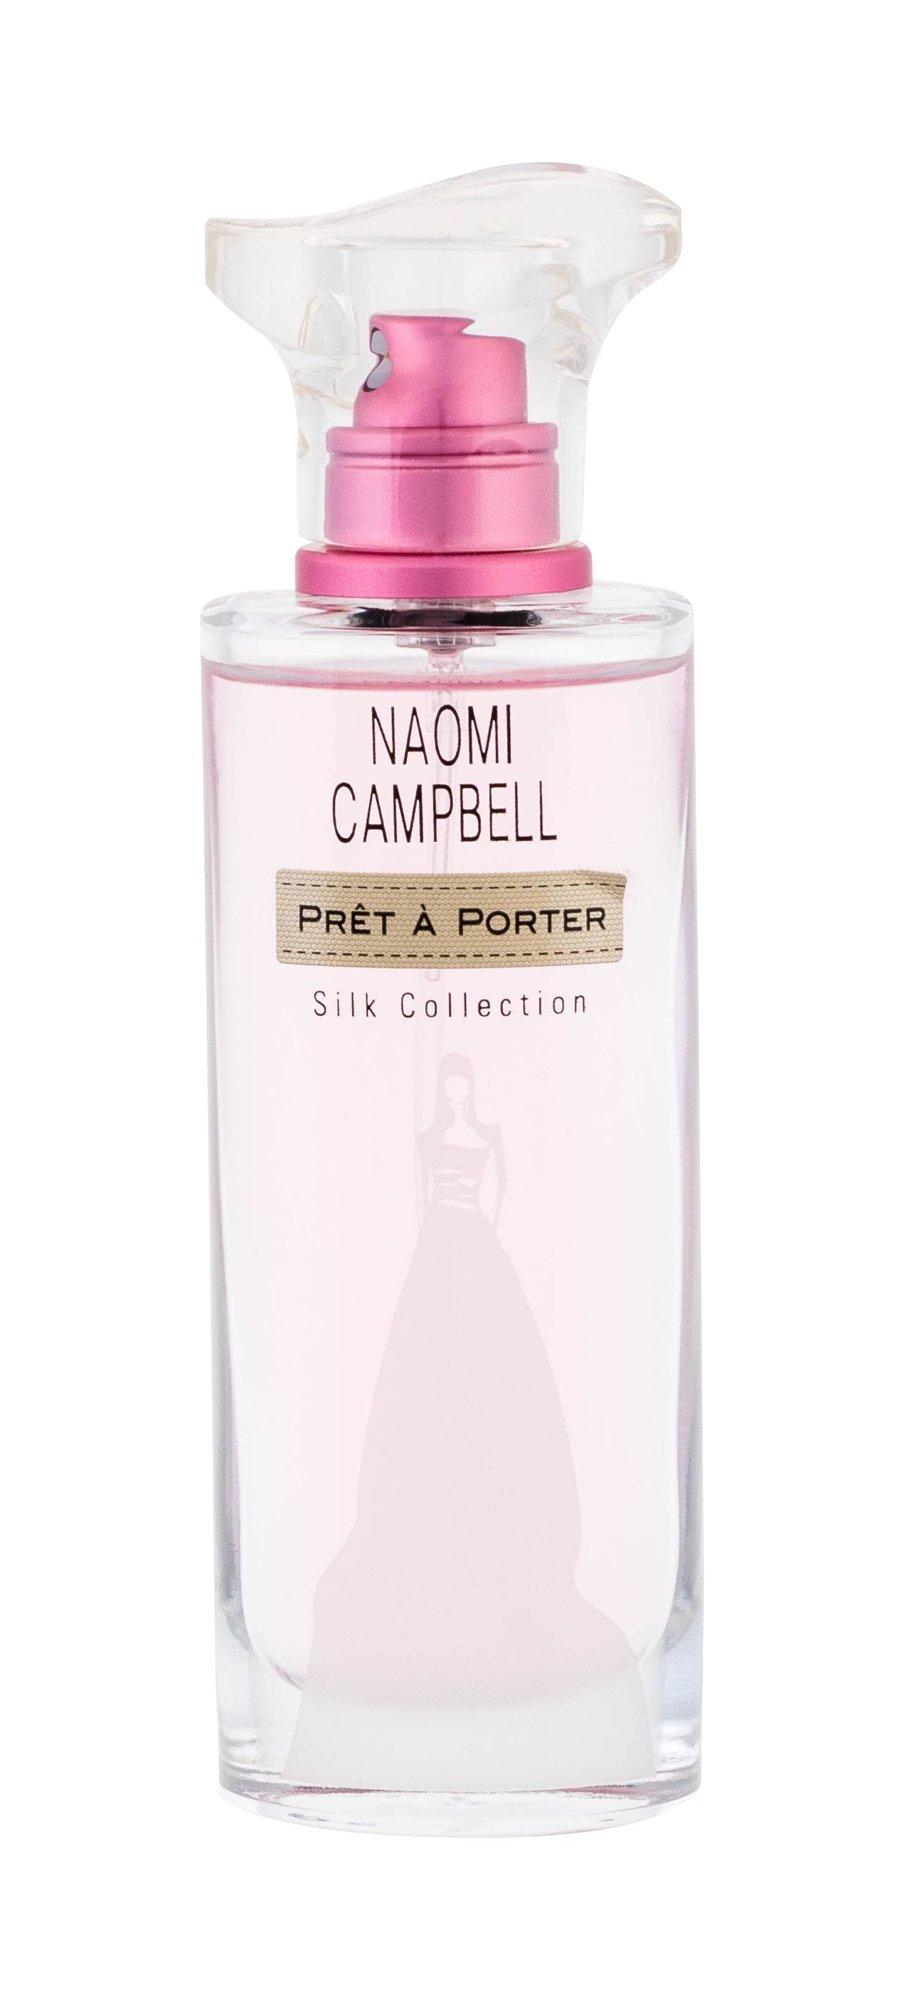 Naomi Campbell Pret a Porter Eau de Parfum 30ml  Silk Collection